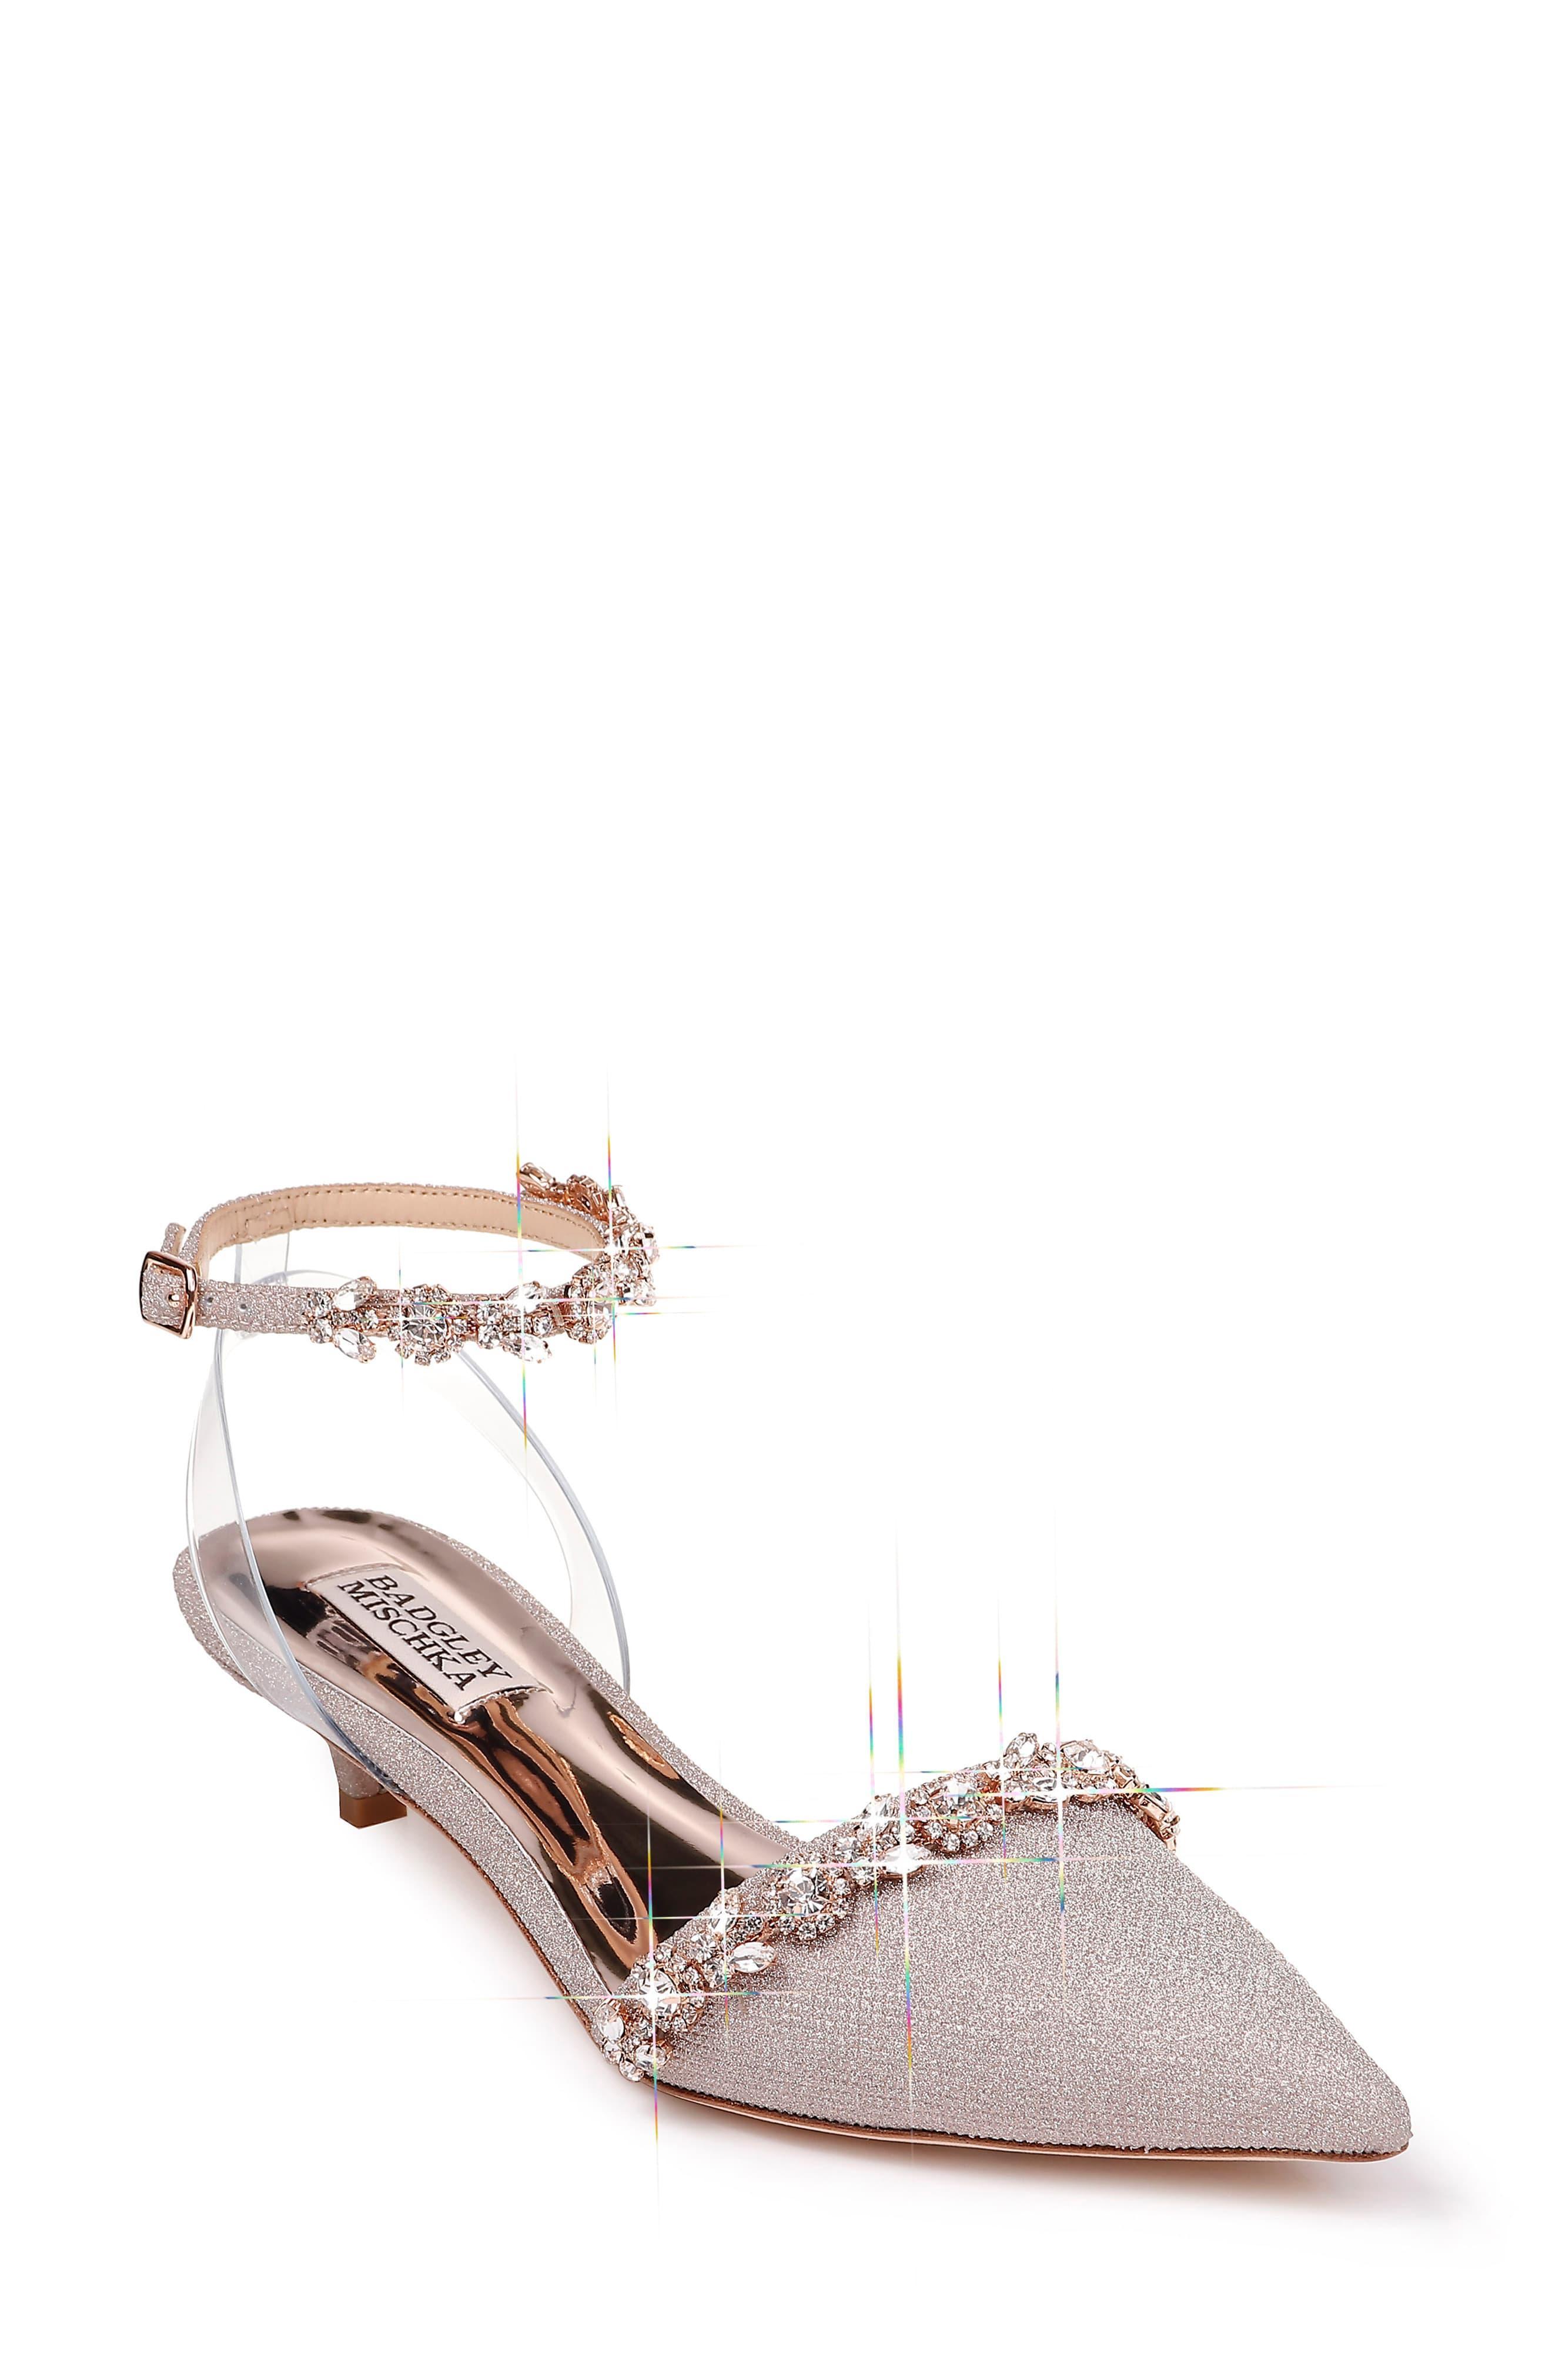 a7a4e28c7c Badgley Mischka Badgley Mischka Addison Crystal Embellished Ankle ...